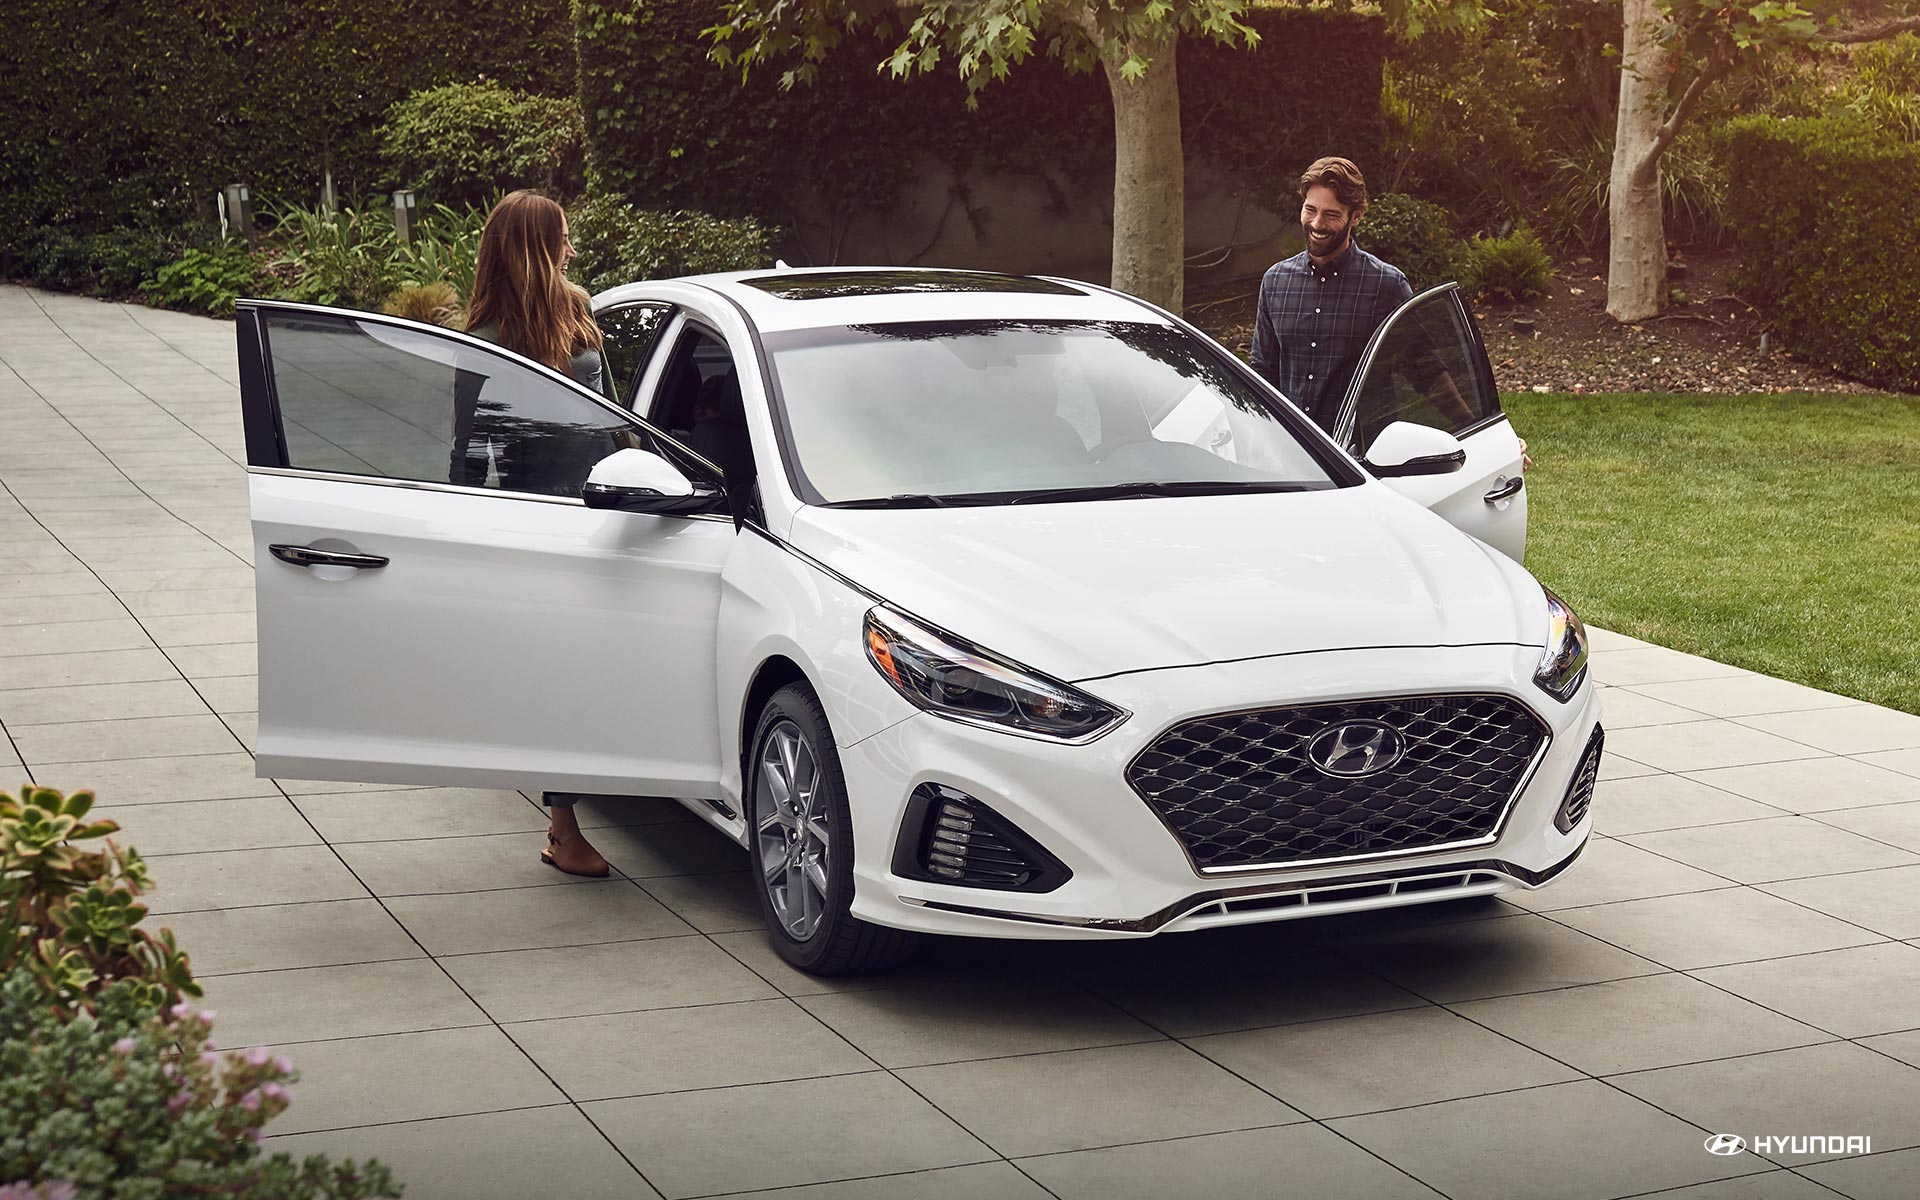 2018 Hyundai Sonata Leasing near Alexandria, VA